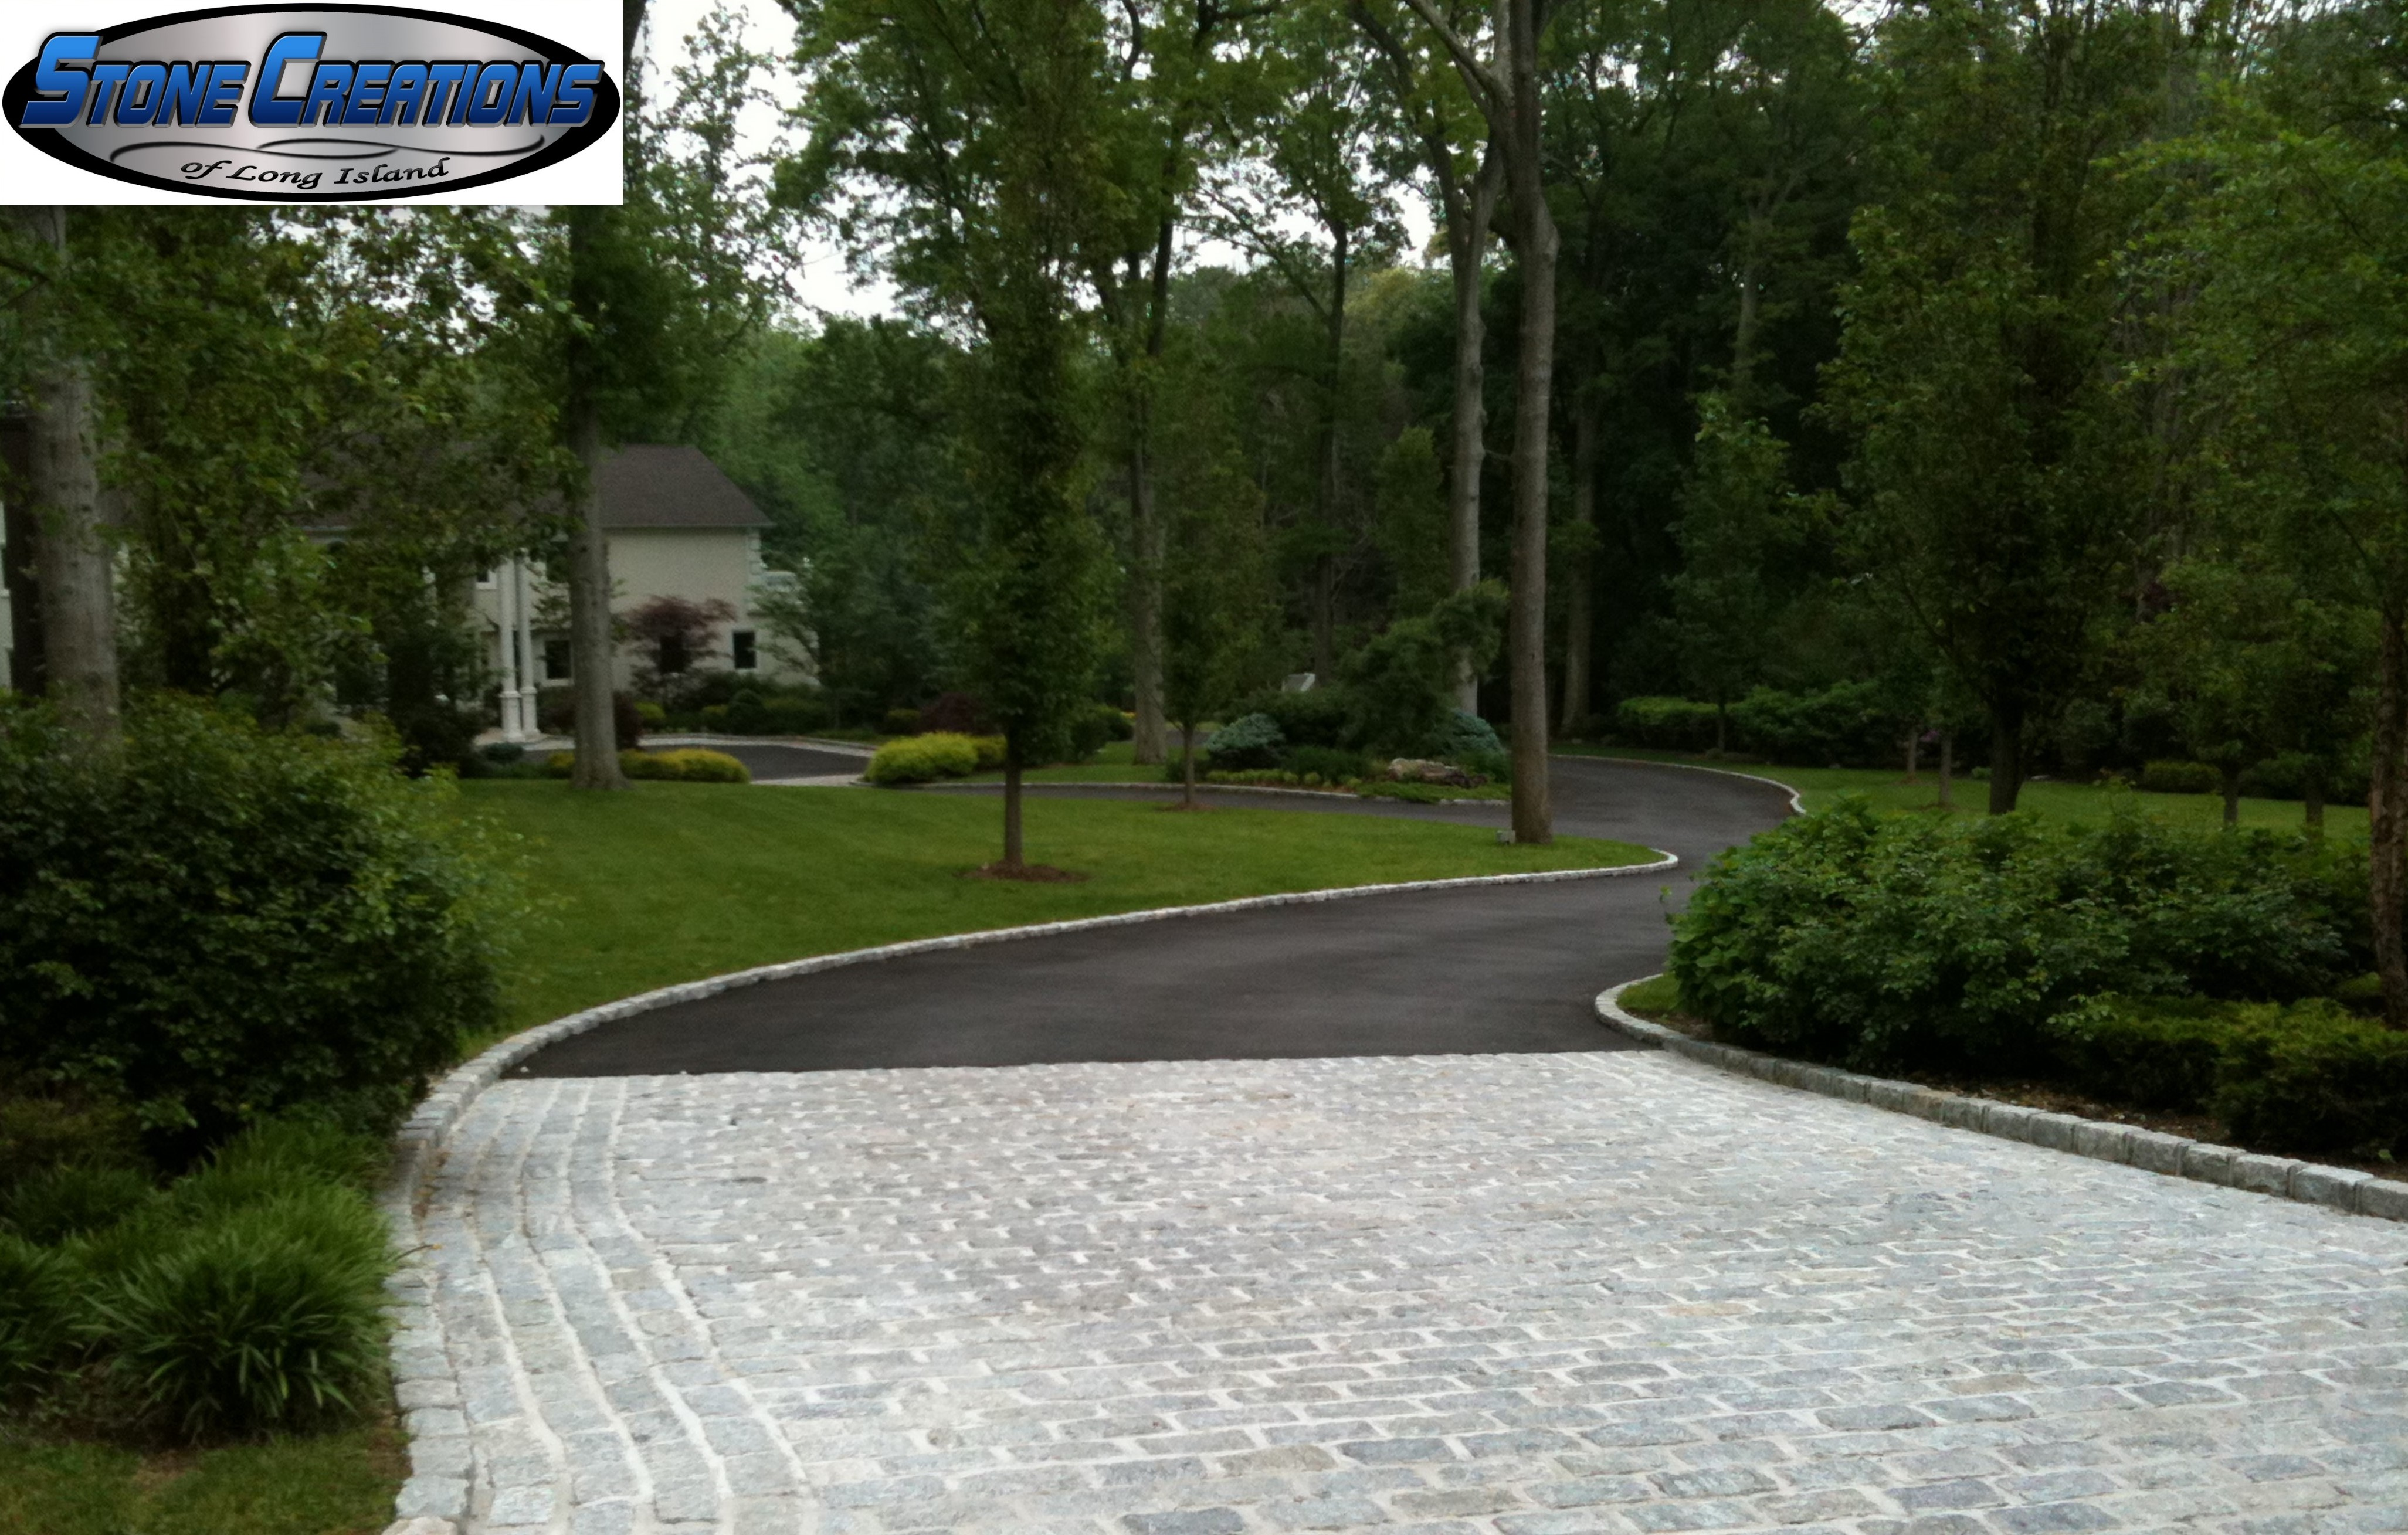 Long Island Driveway Specialist - Stone Creations of Long Island Pavers and Masonry Corp